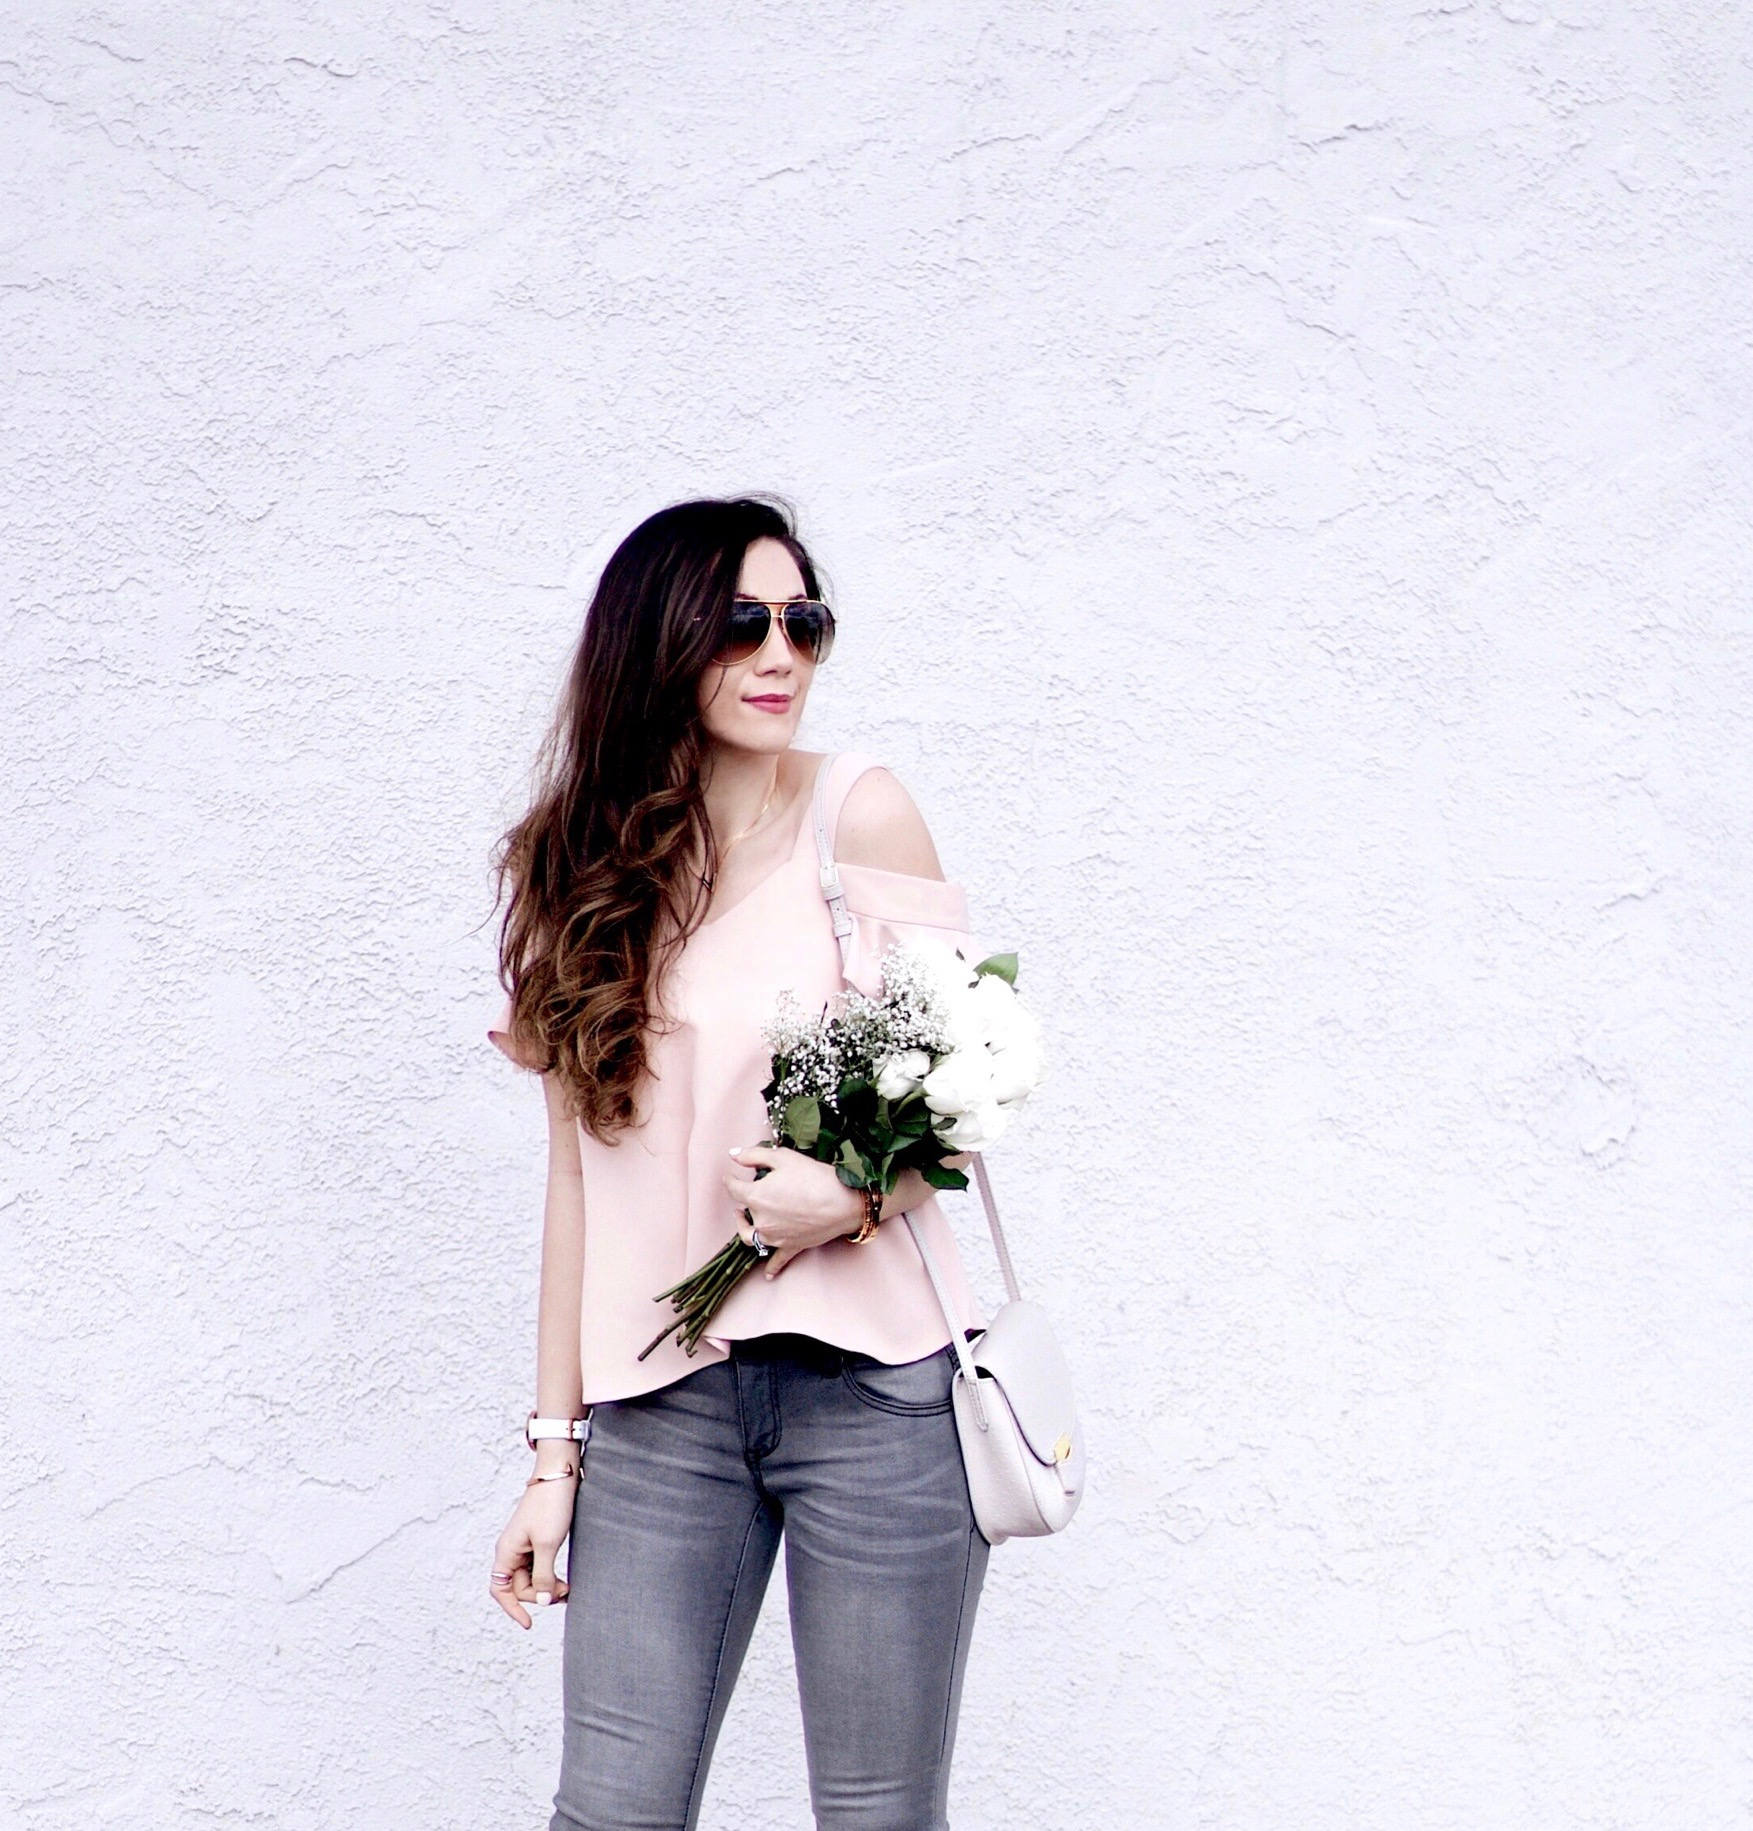 Valentine's Day Outfit Inspiration. Pink Toyshop Bardot Top, Grey 1822 Frayed Hem Denim, Blush Kitten Heels, White Roses, Rose Gold Jewelry, Klasse14 Watch